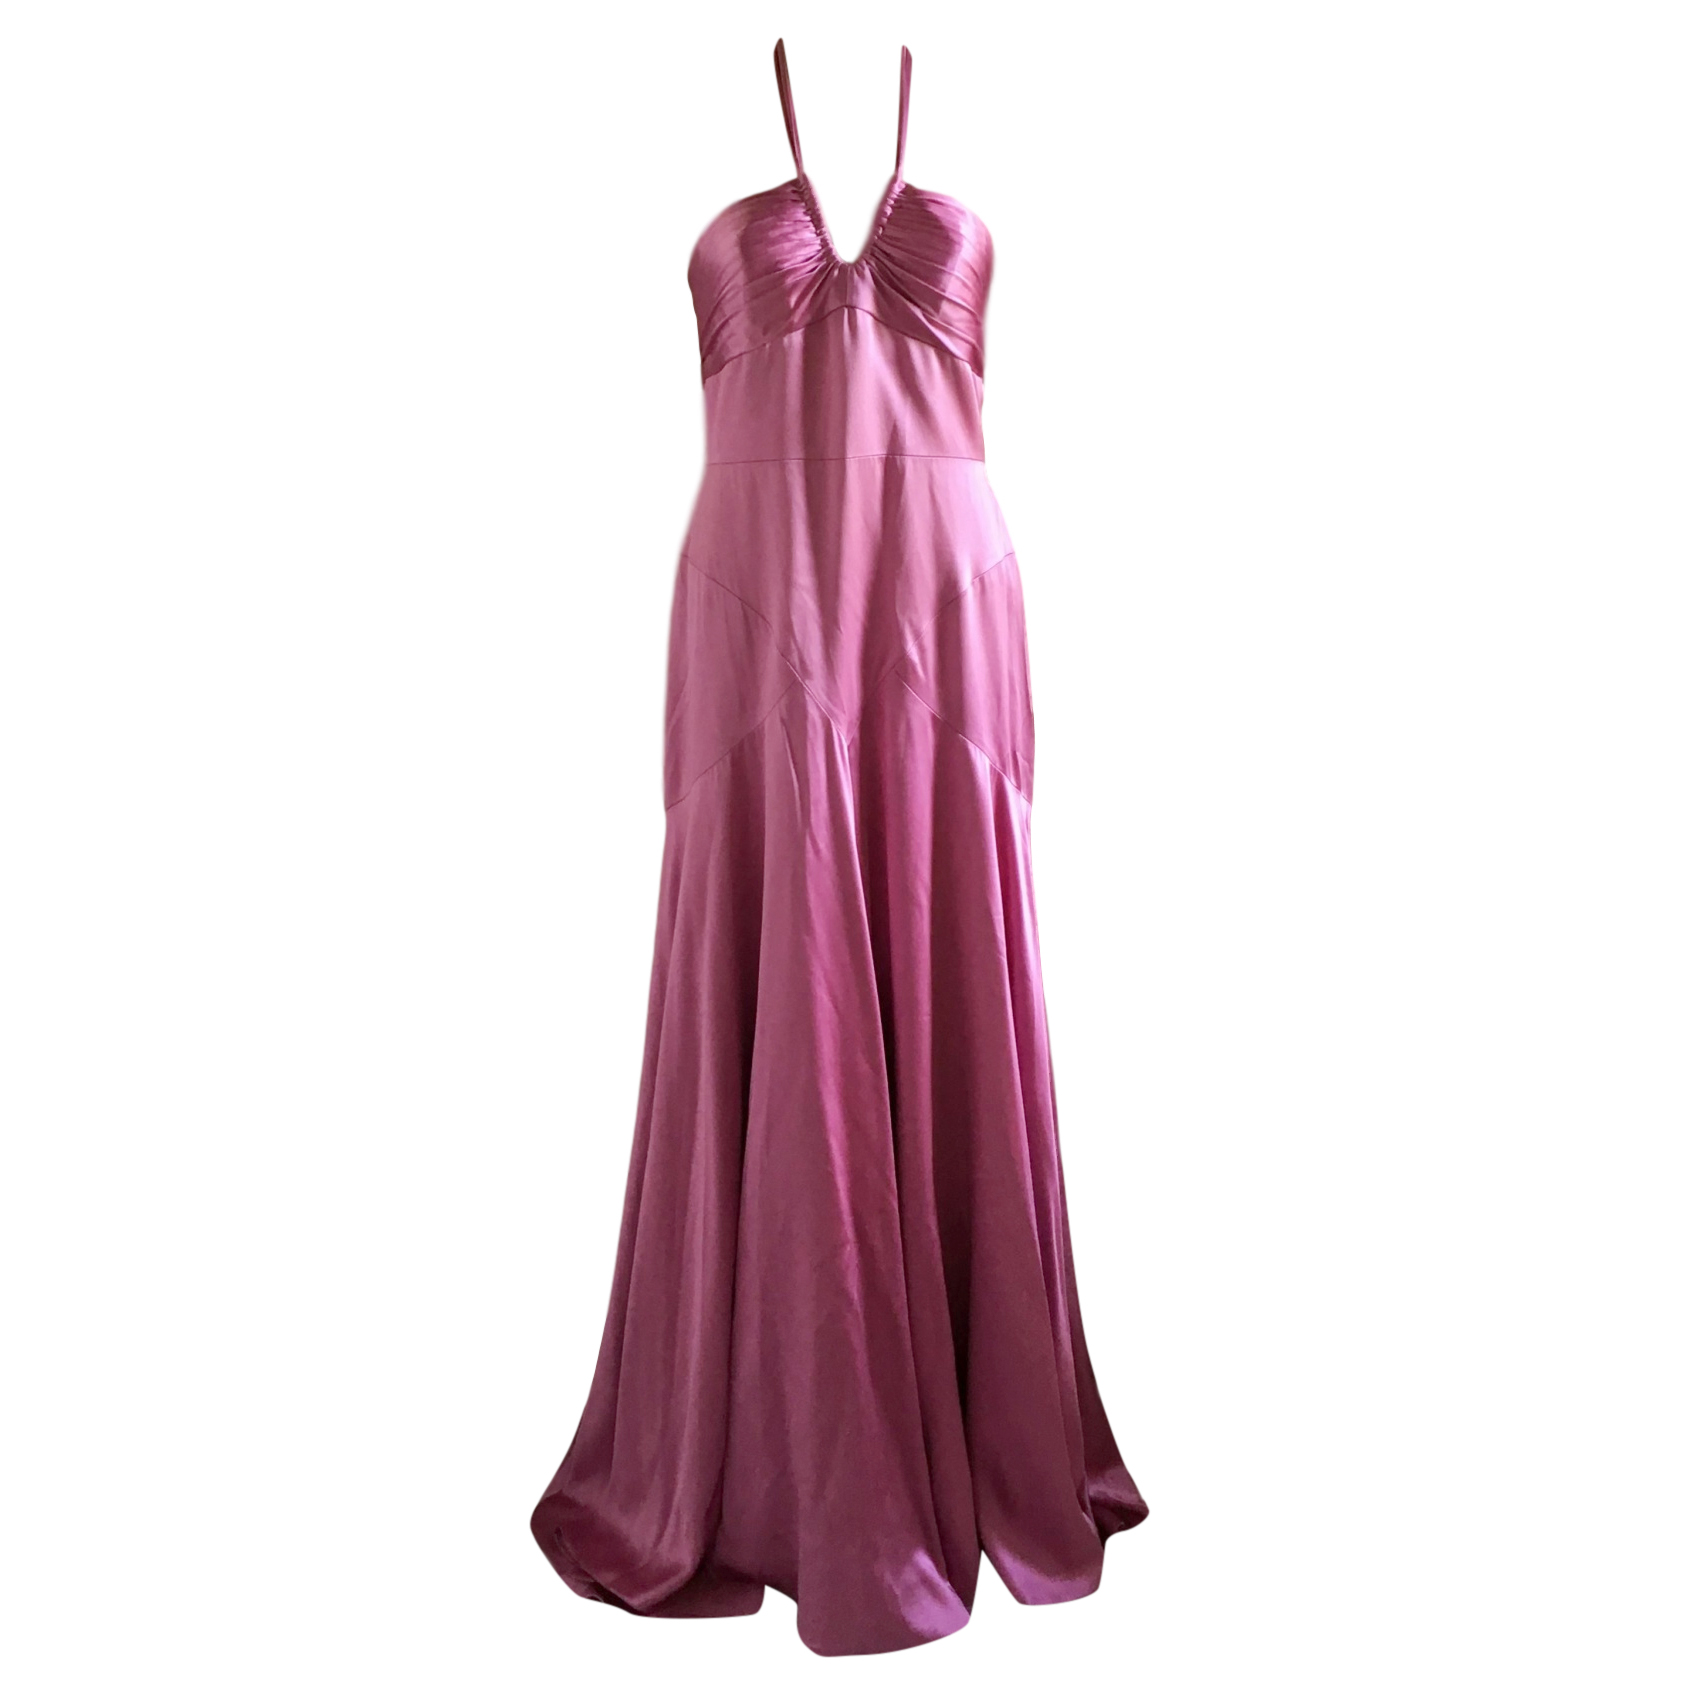 Monique L'huilier pink silk halter neck gown